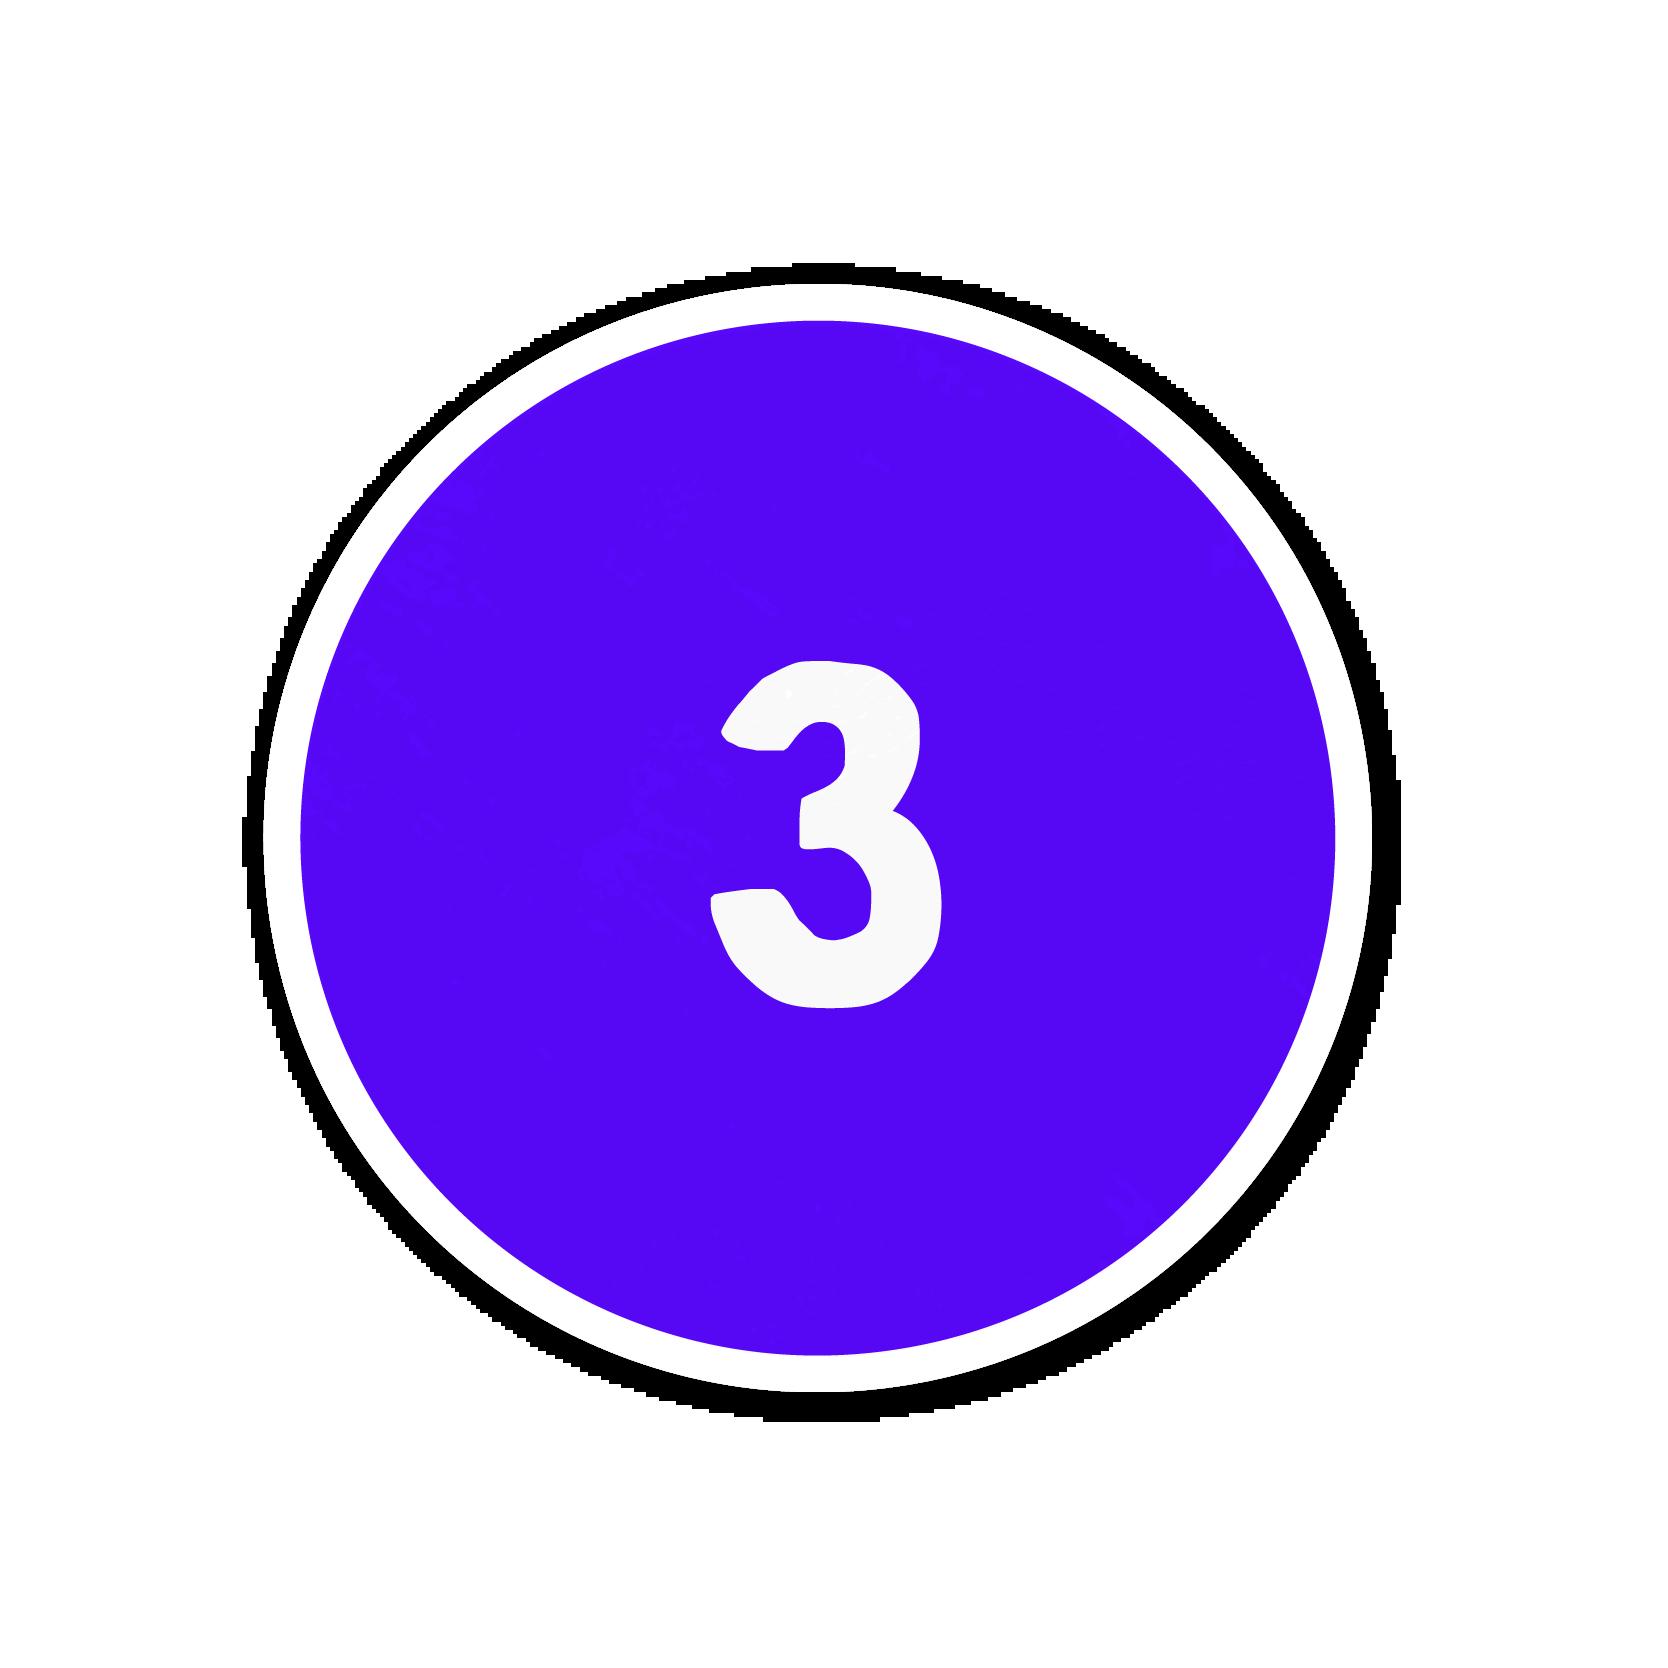 A purple number three sticker